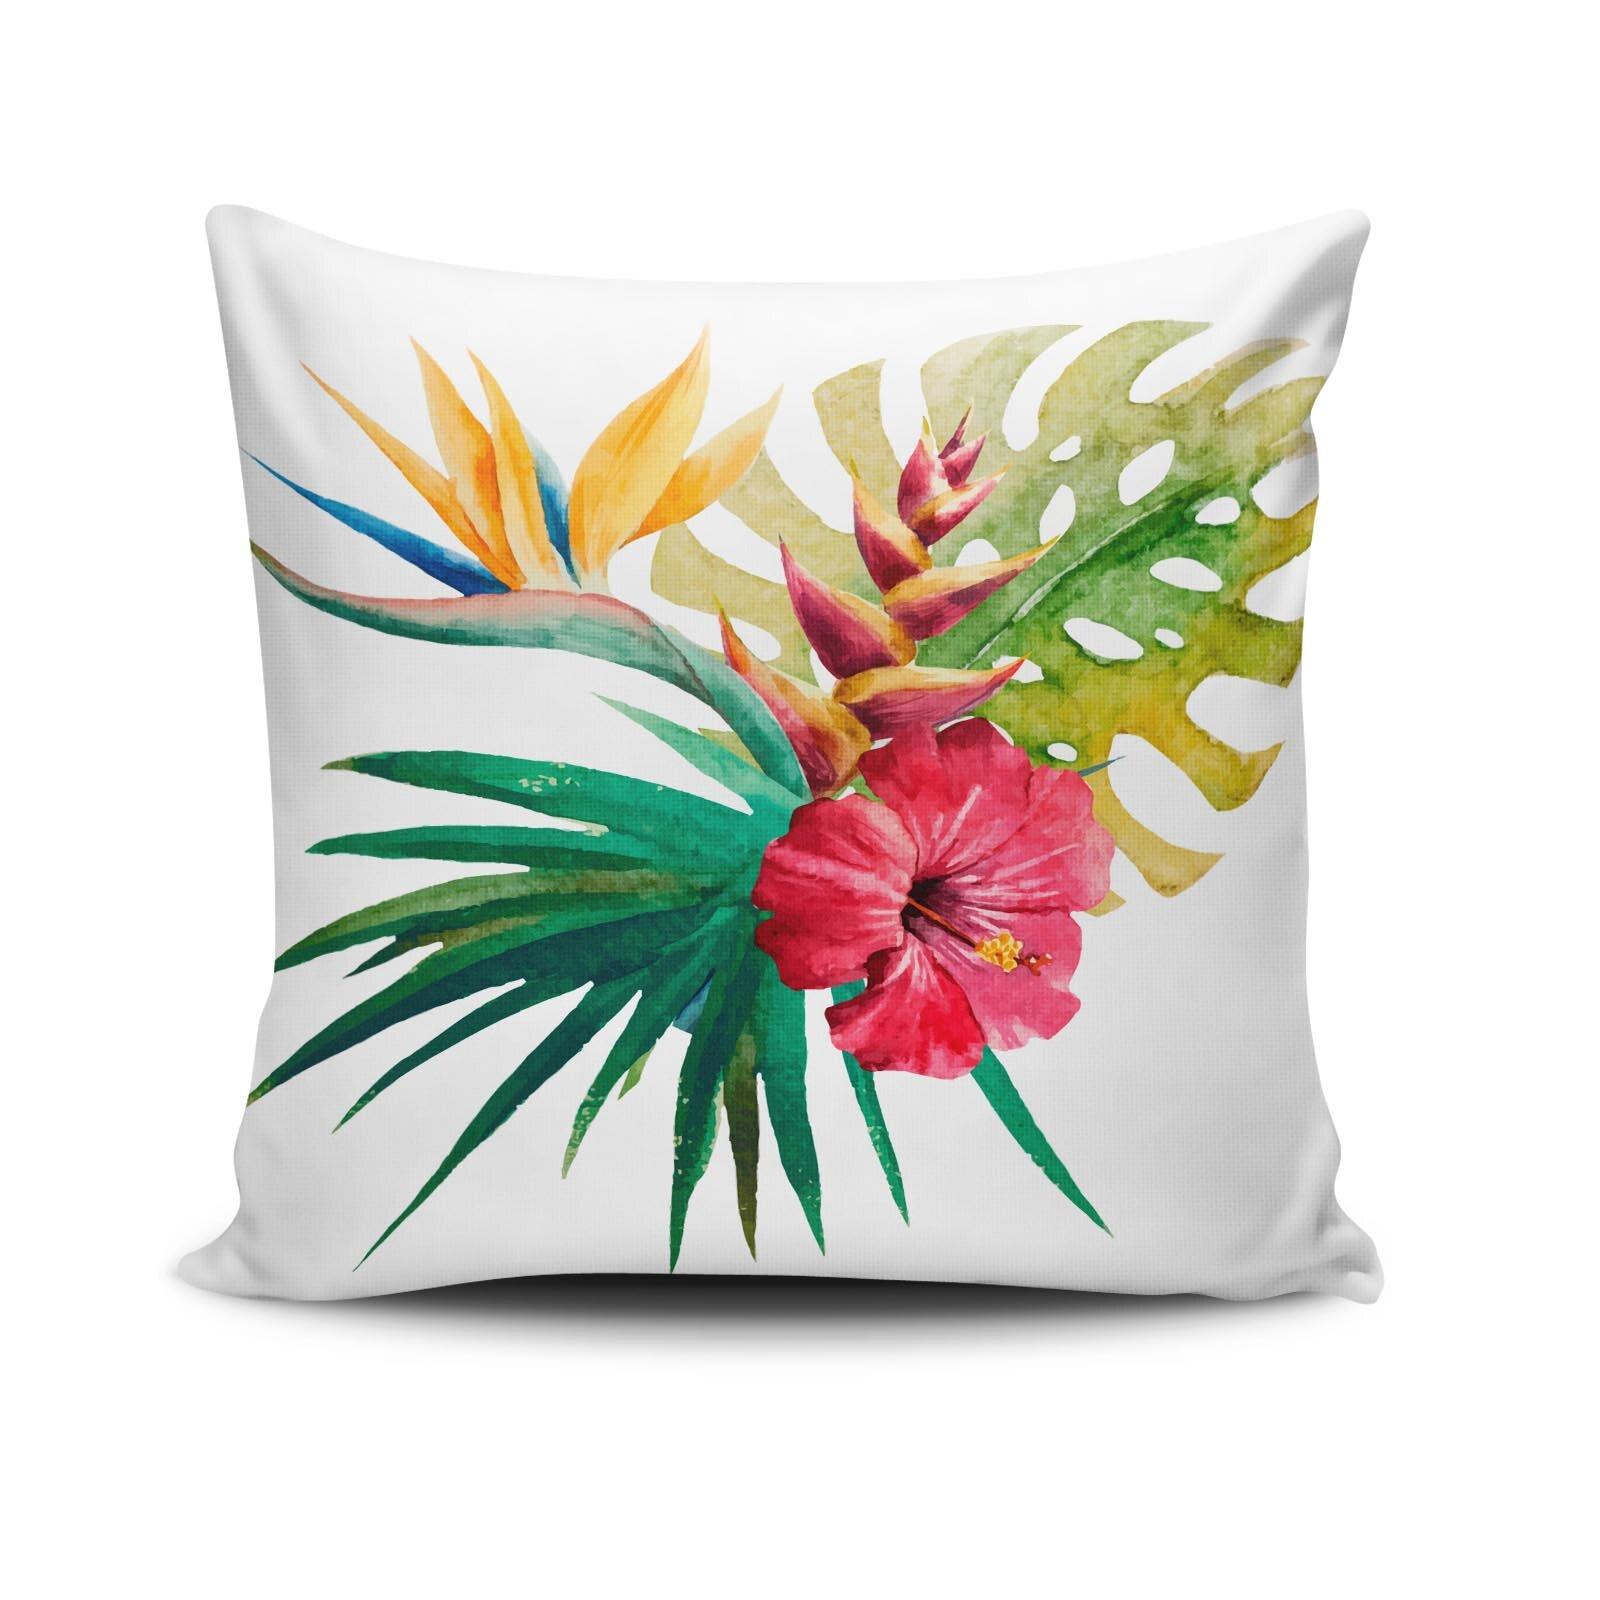 Perna decorativa Cushion Love, Dimensiune: 45 x 45 cm, Material exterior: 50% bumbac / 50% poliester 768CLV0202